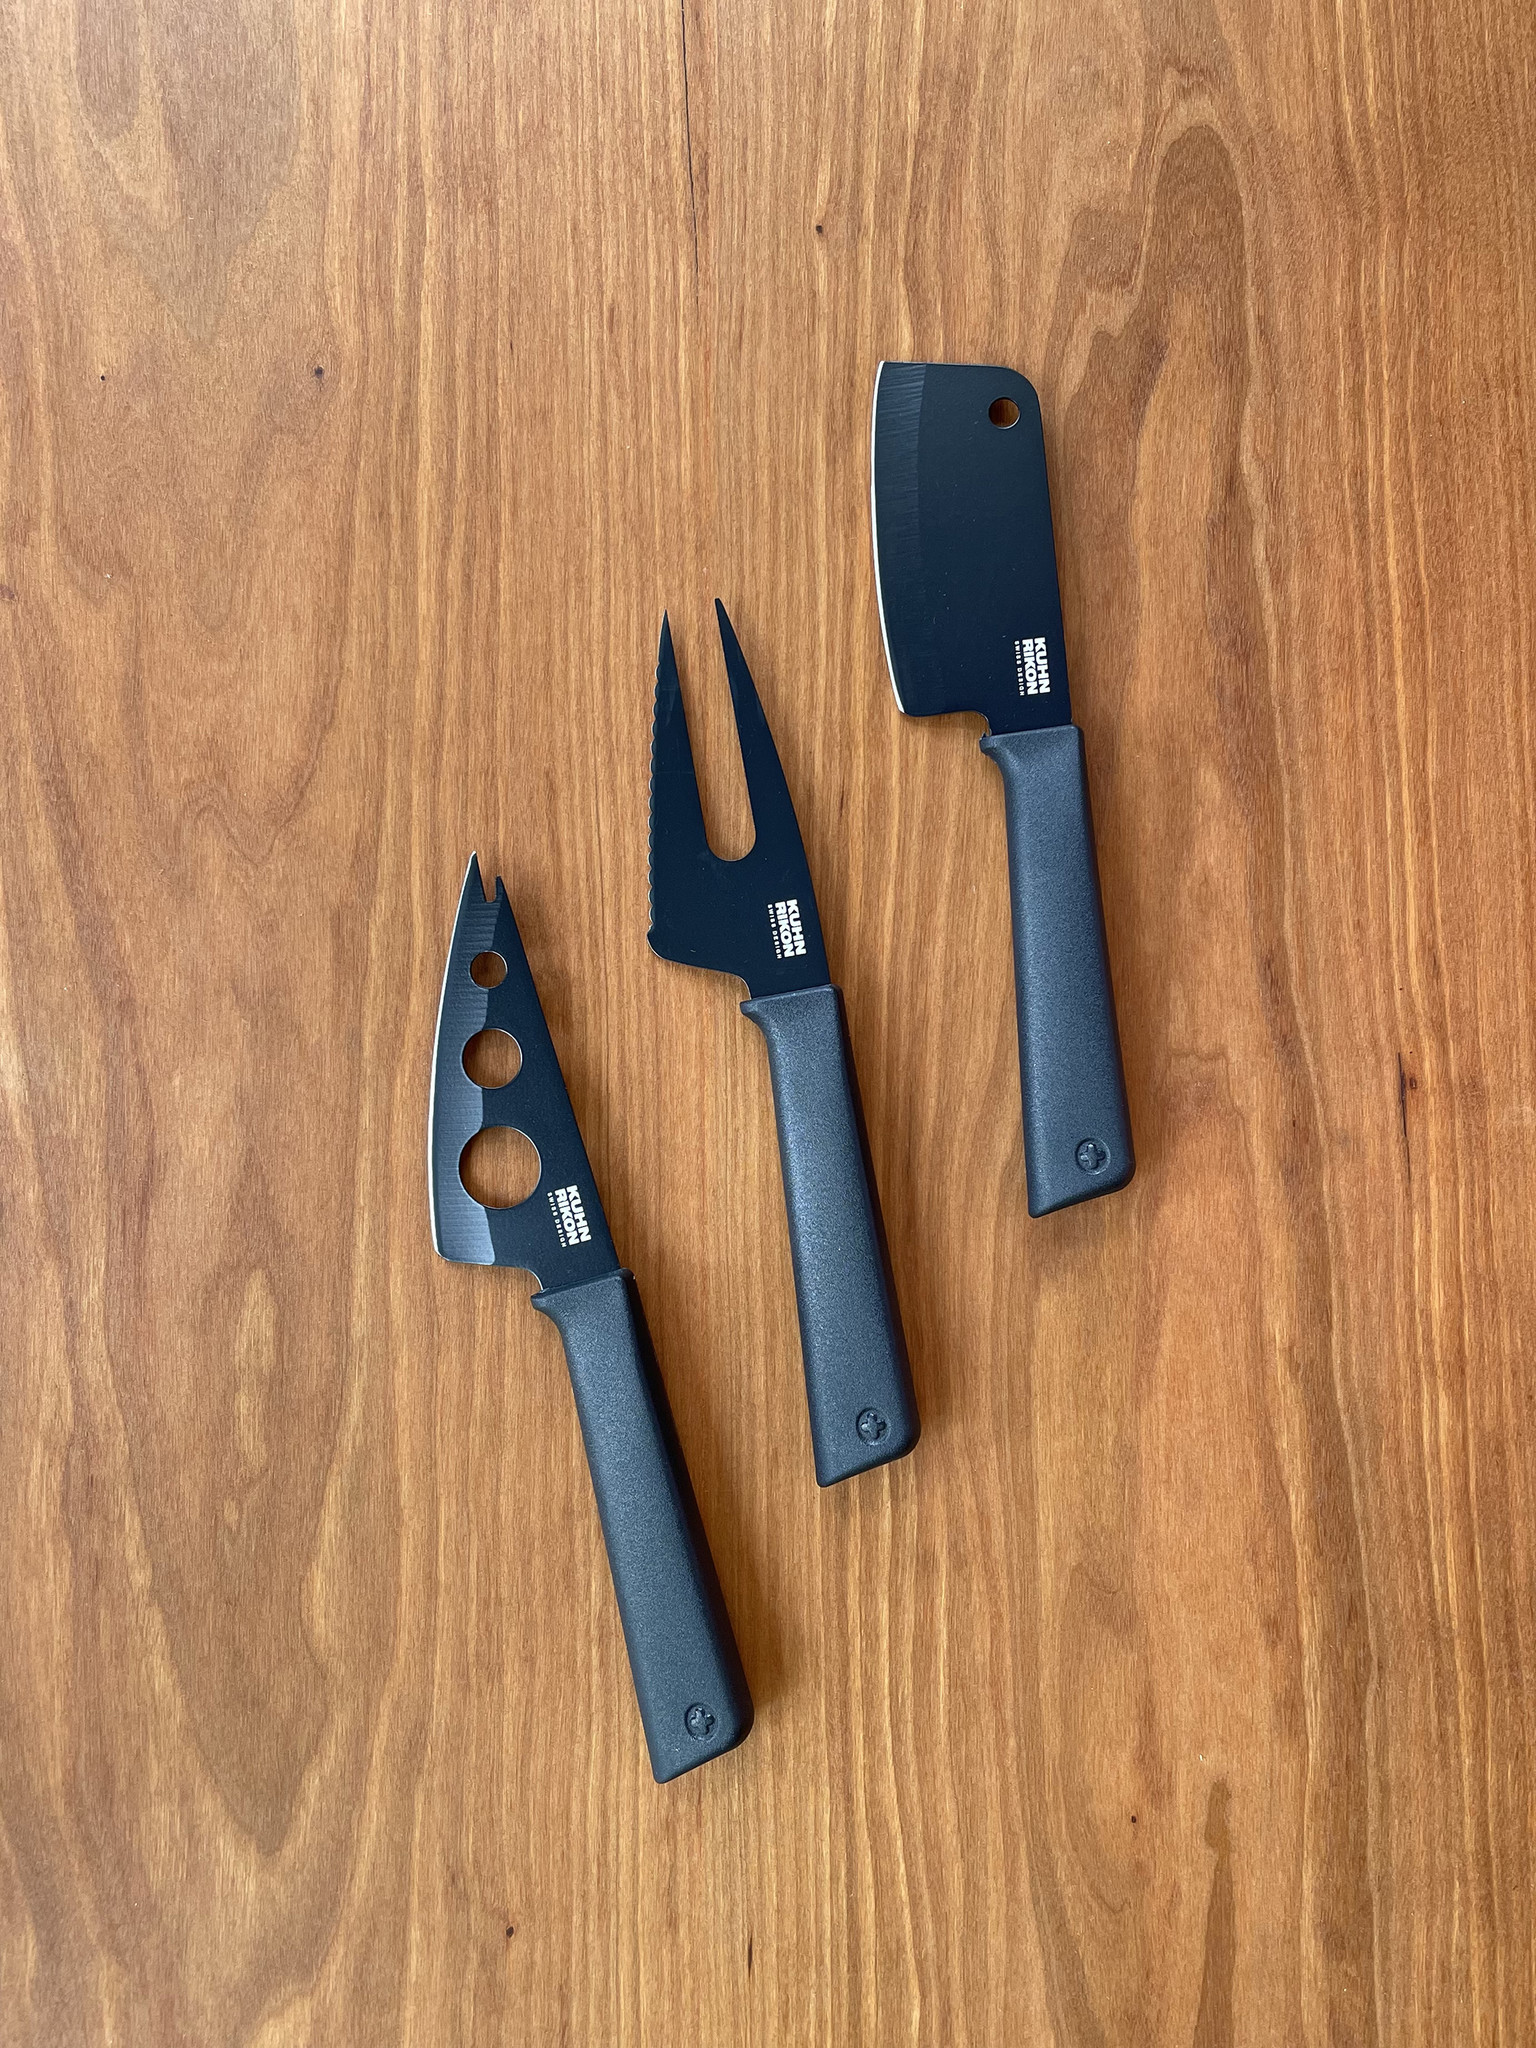 Kuhn Rikon 3 Piece Colori Cheese Knife Set in Graphite-1